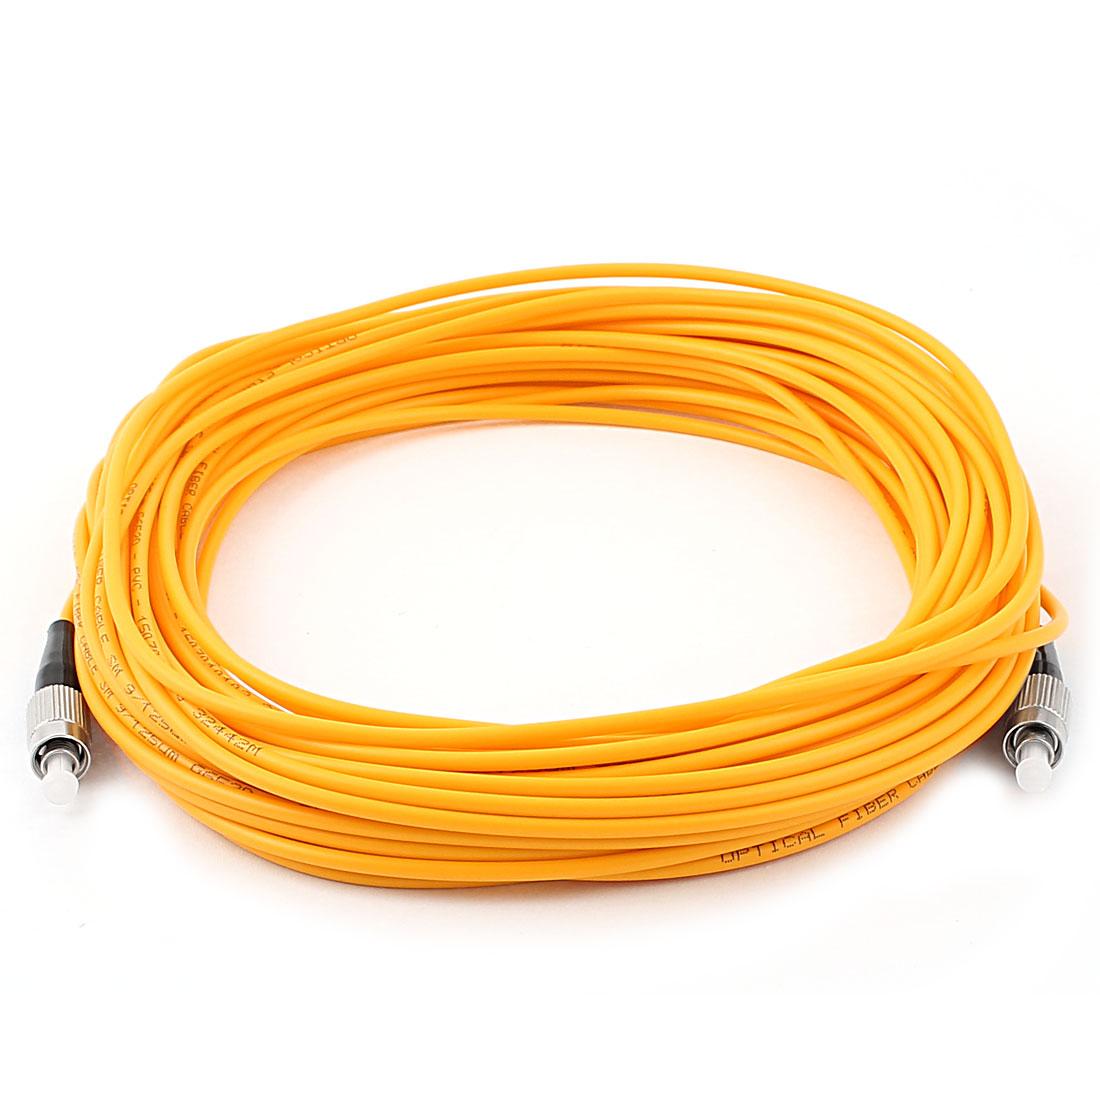 15M 49Ft Jumper Cable Simplex Singlemode FC-FC Fiber Optic Patch Cord